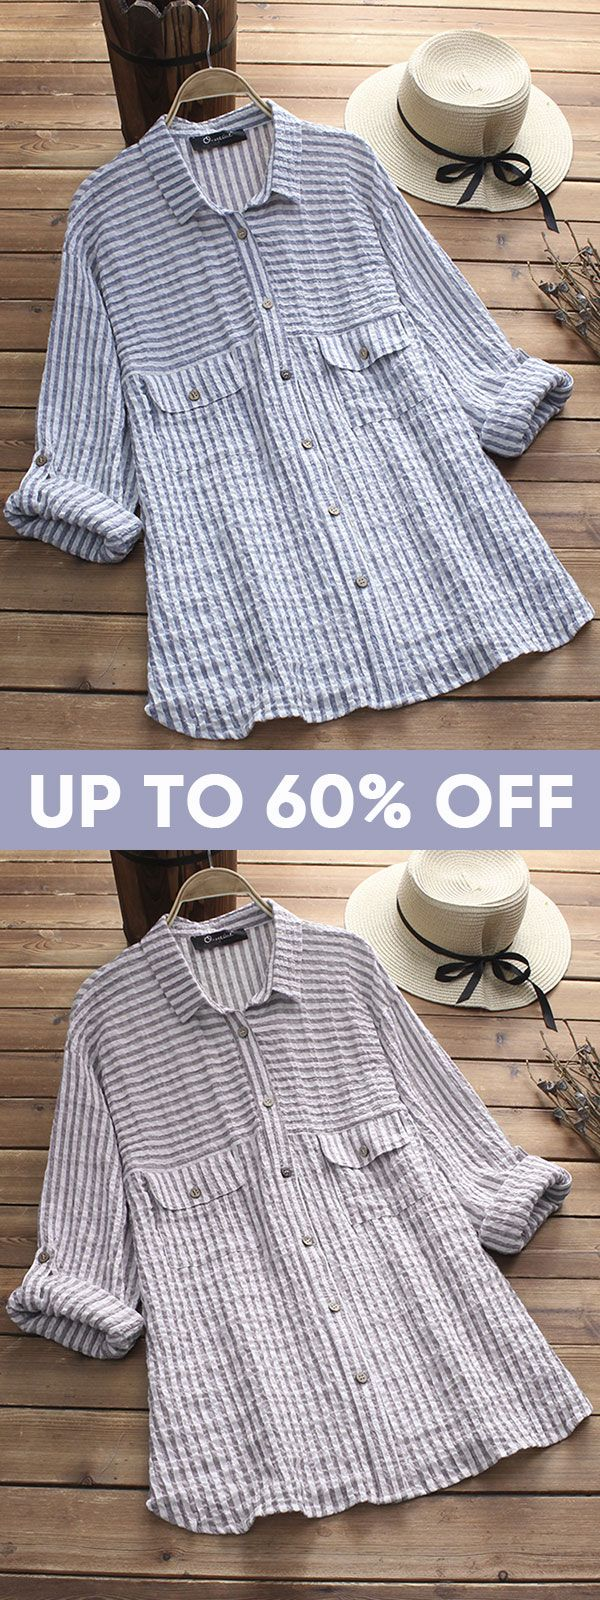 Onewe vintage lapel striped shirts with pockets stripe vintage